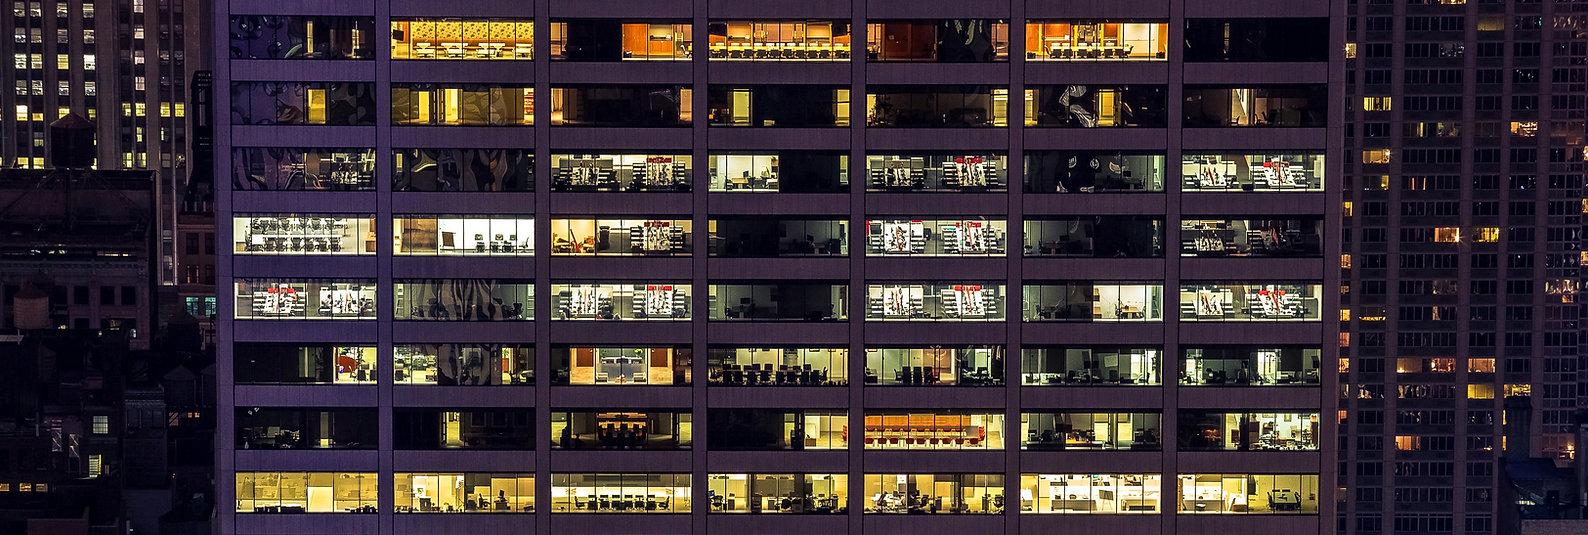 Edificio inteligente.jpg